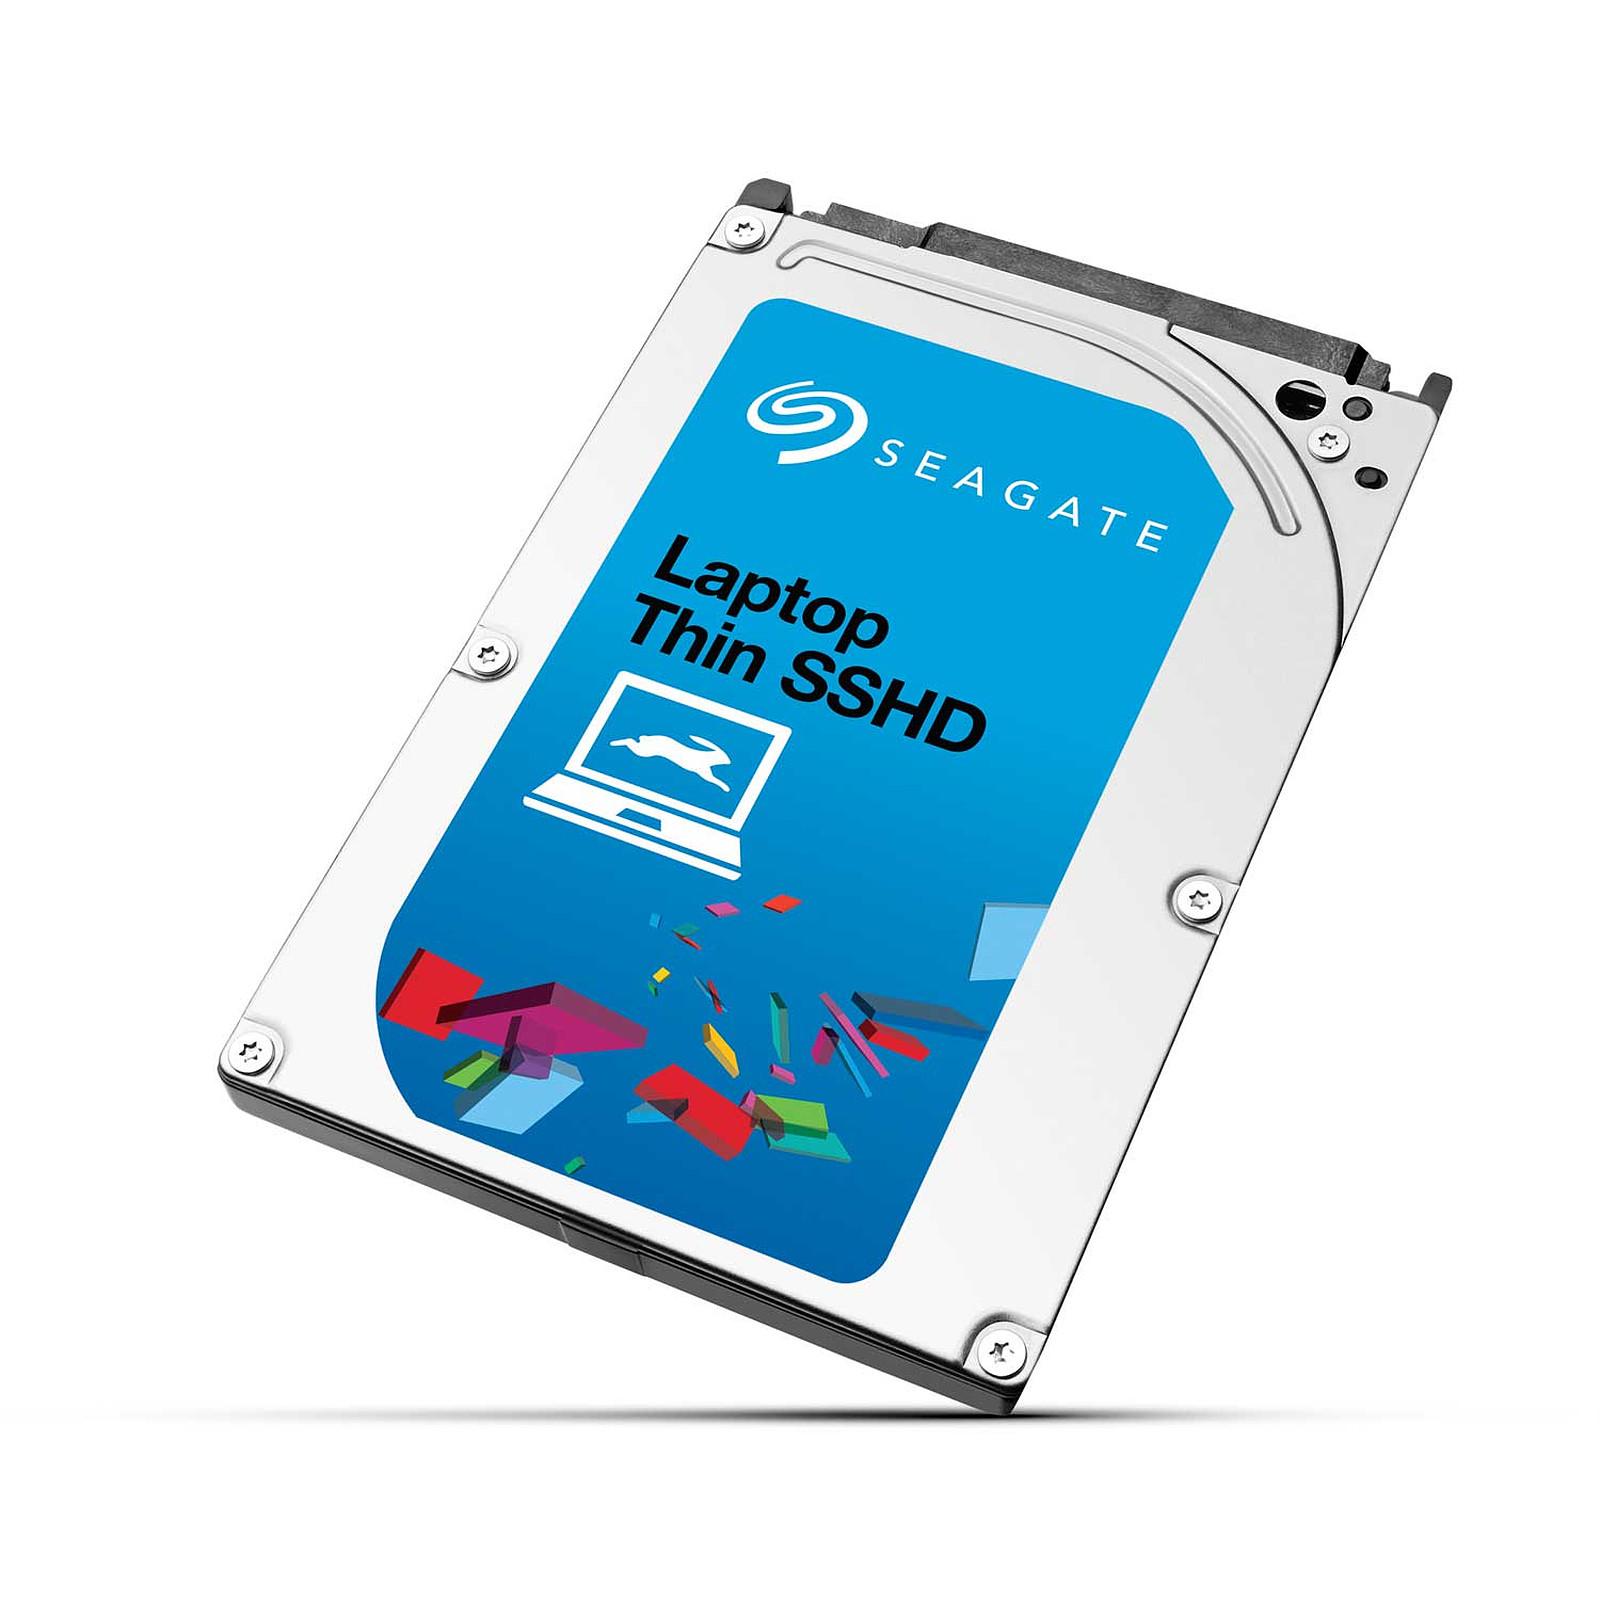 Seagate Laptop Thin SSHD 500 Go